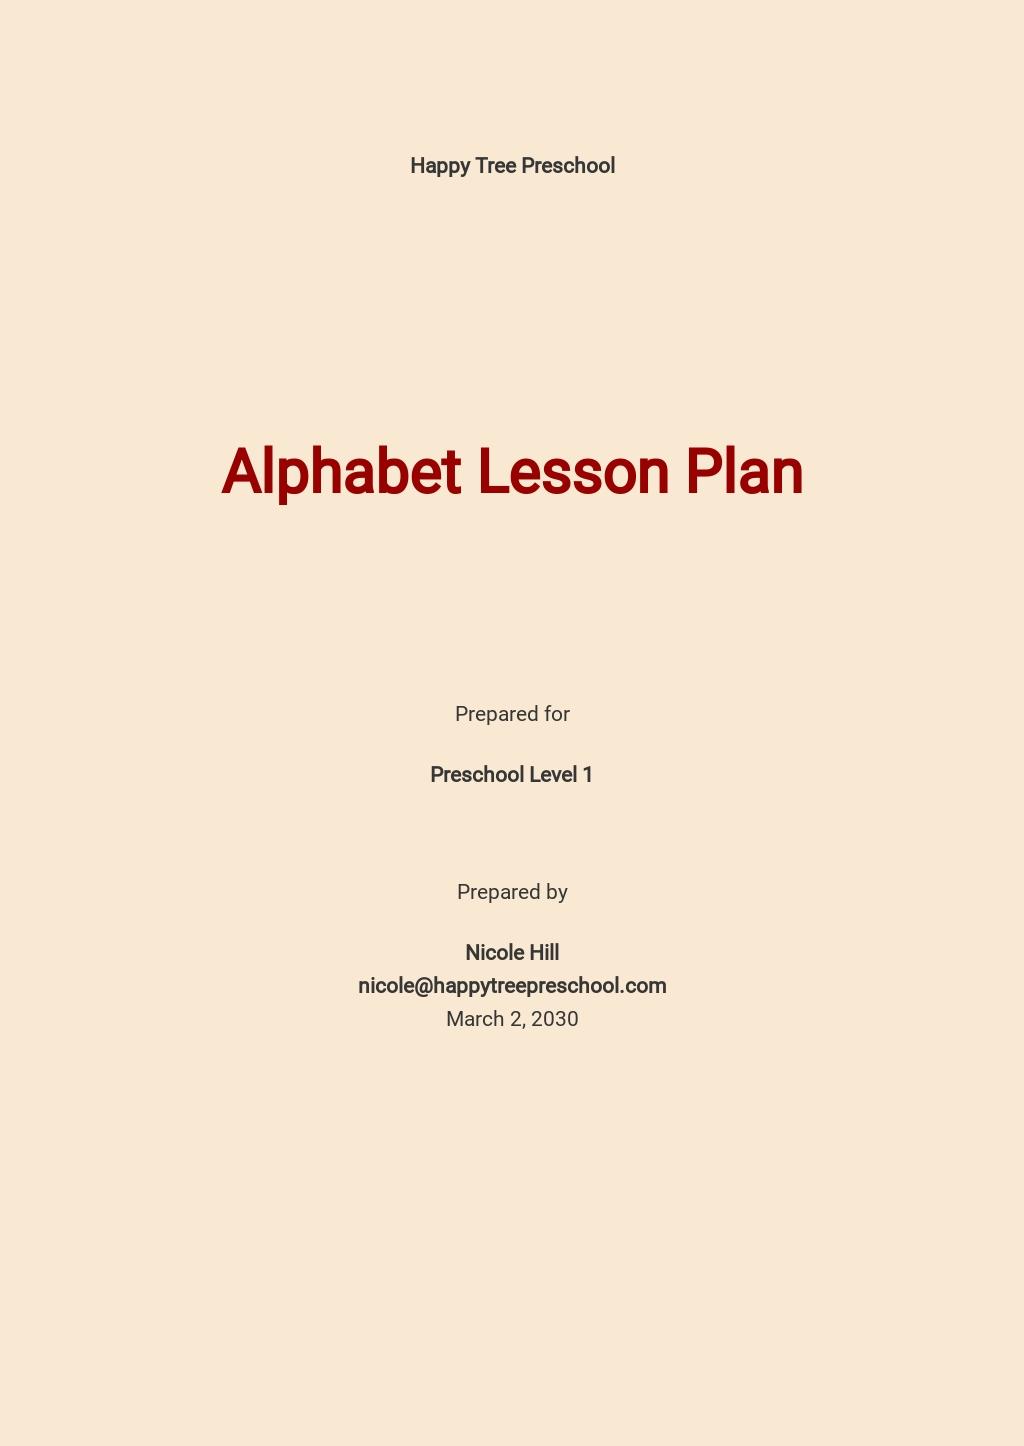 Preschool Lesson Plan Template.jpe